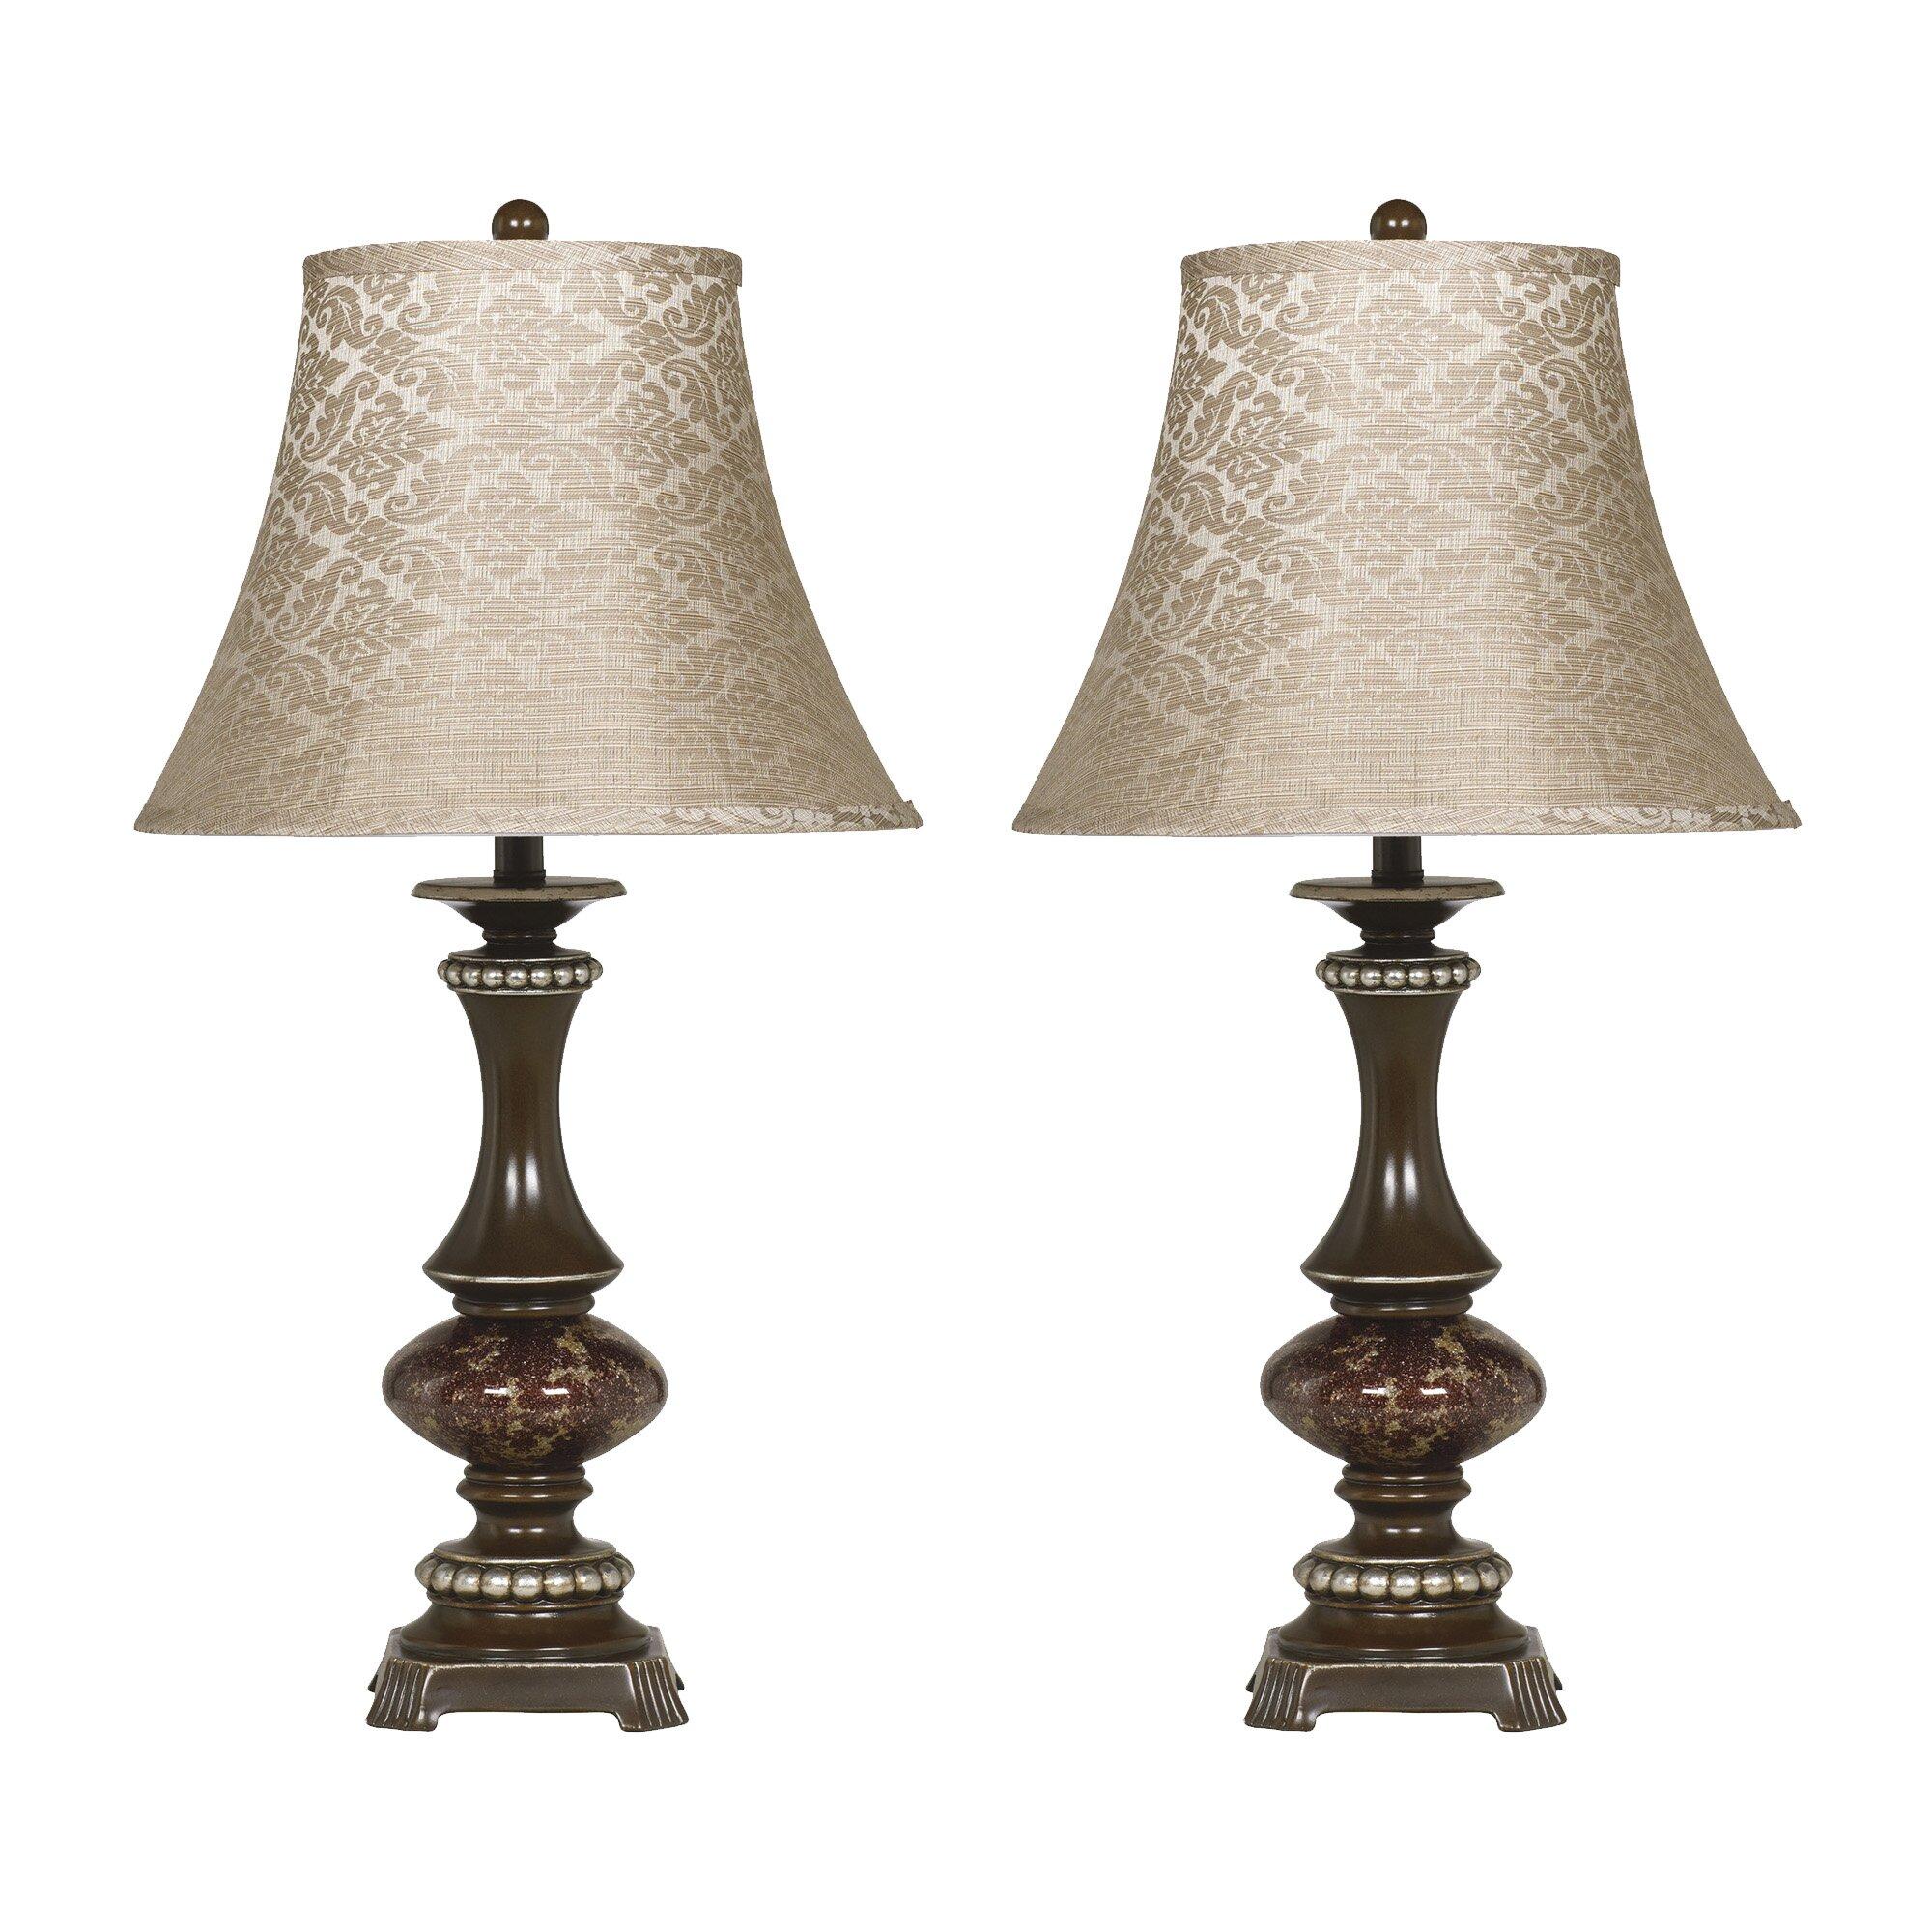 lighting lamps table lamps signature design by ashley sku gnt4974. Black Bedroom Furniture Sets. Home Design Ideas